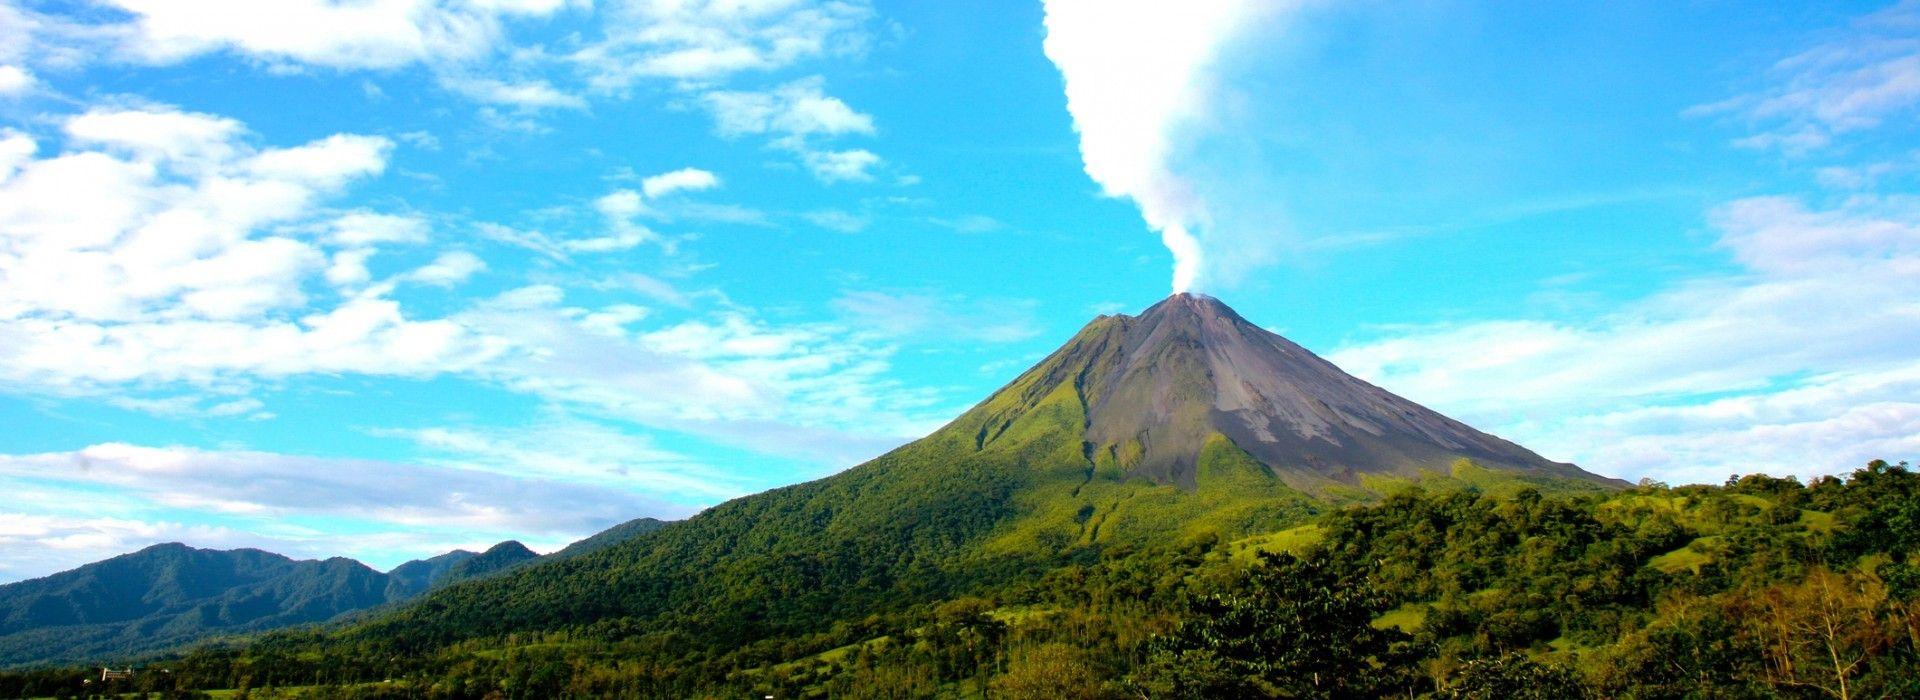 Zip lining Tours in Costa Rica